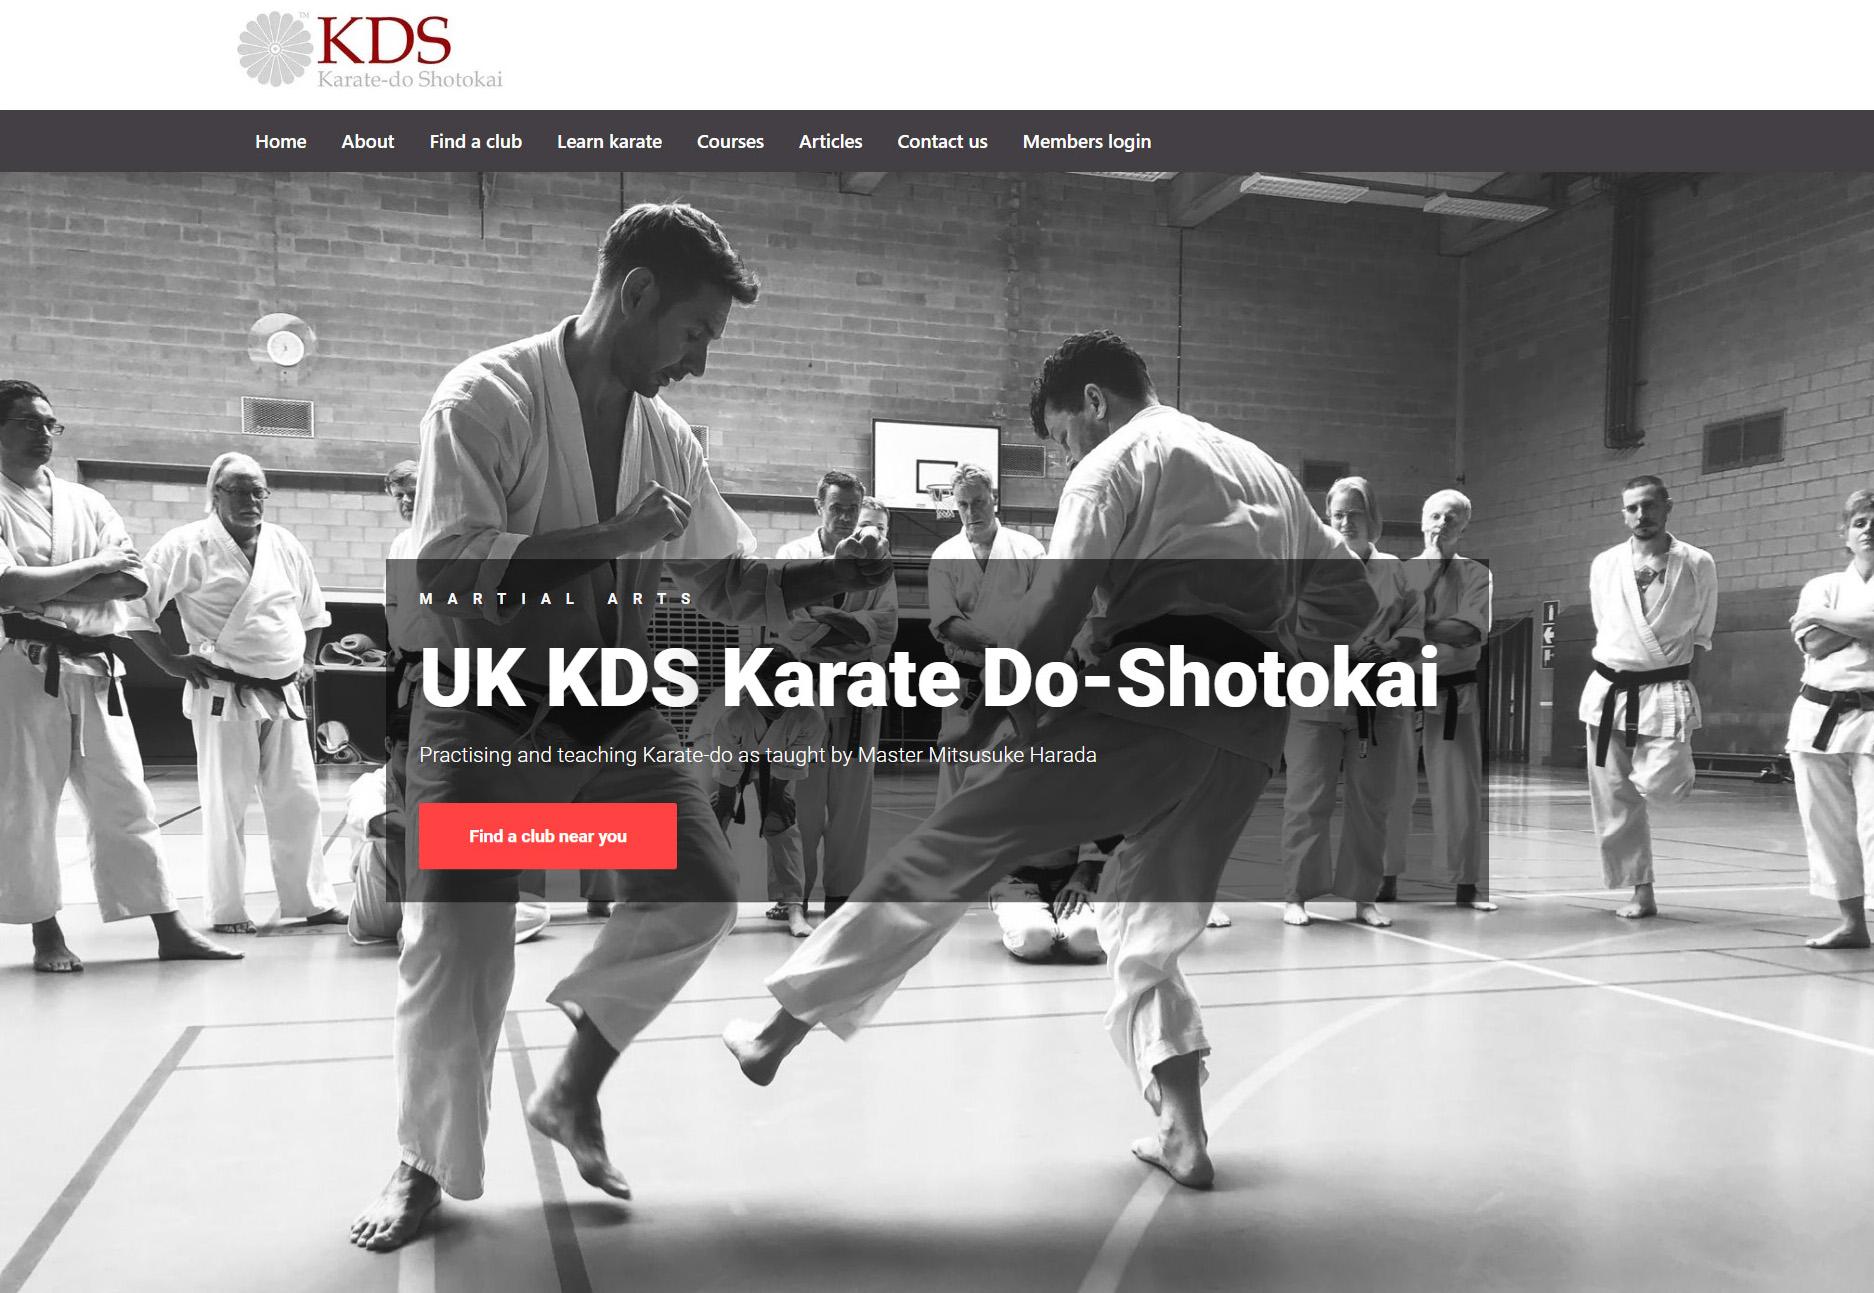 Screenshot of the new website